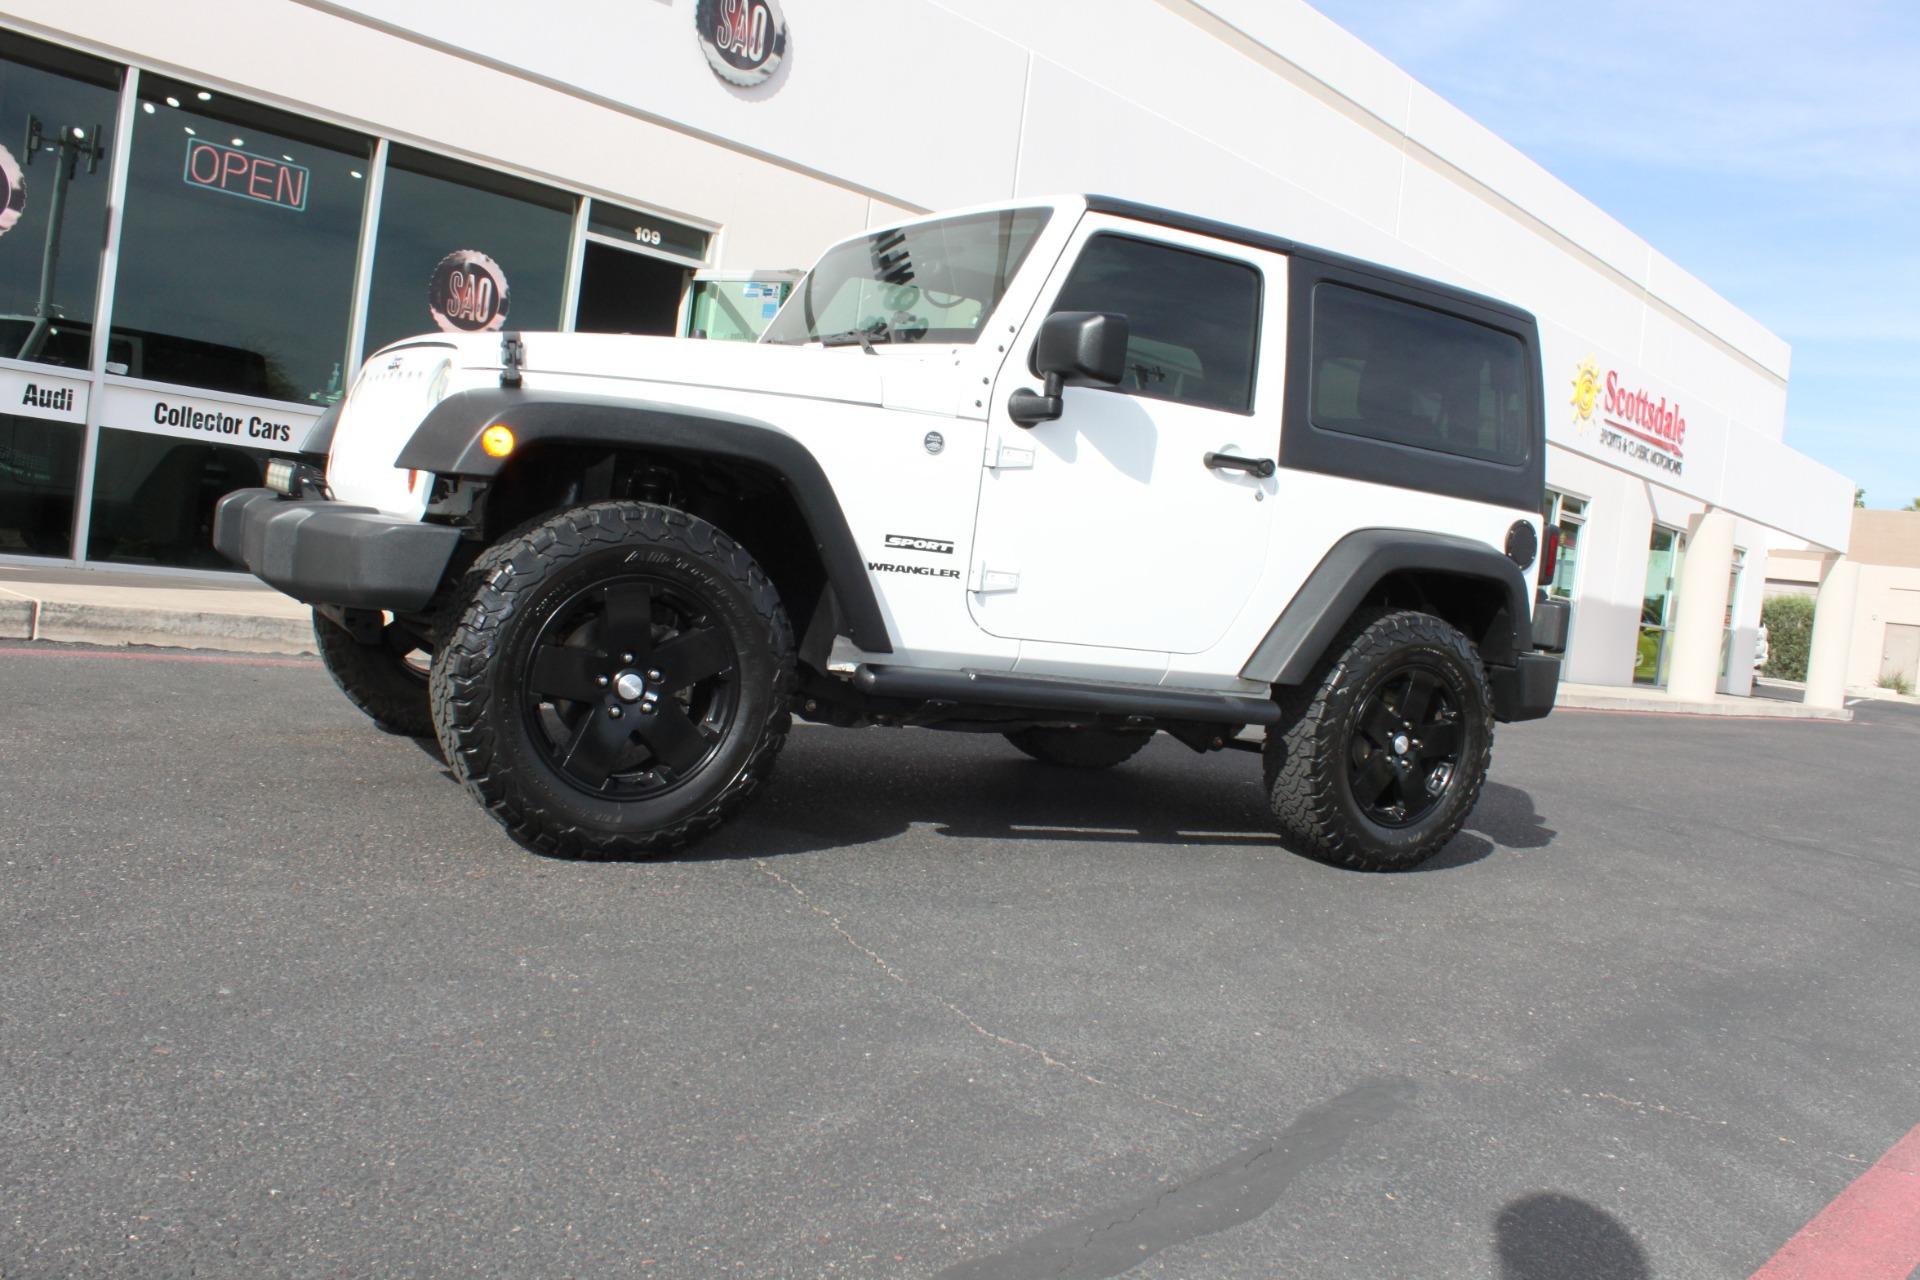 Used-2012-Jeep-Wrangler-Freedom-Edition-4X4-Lexus